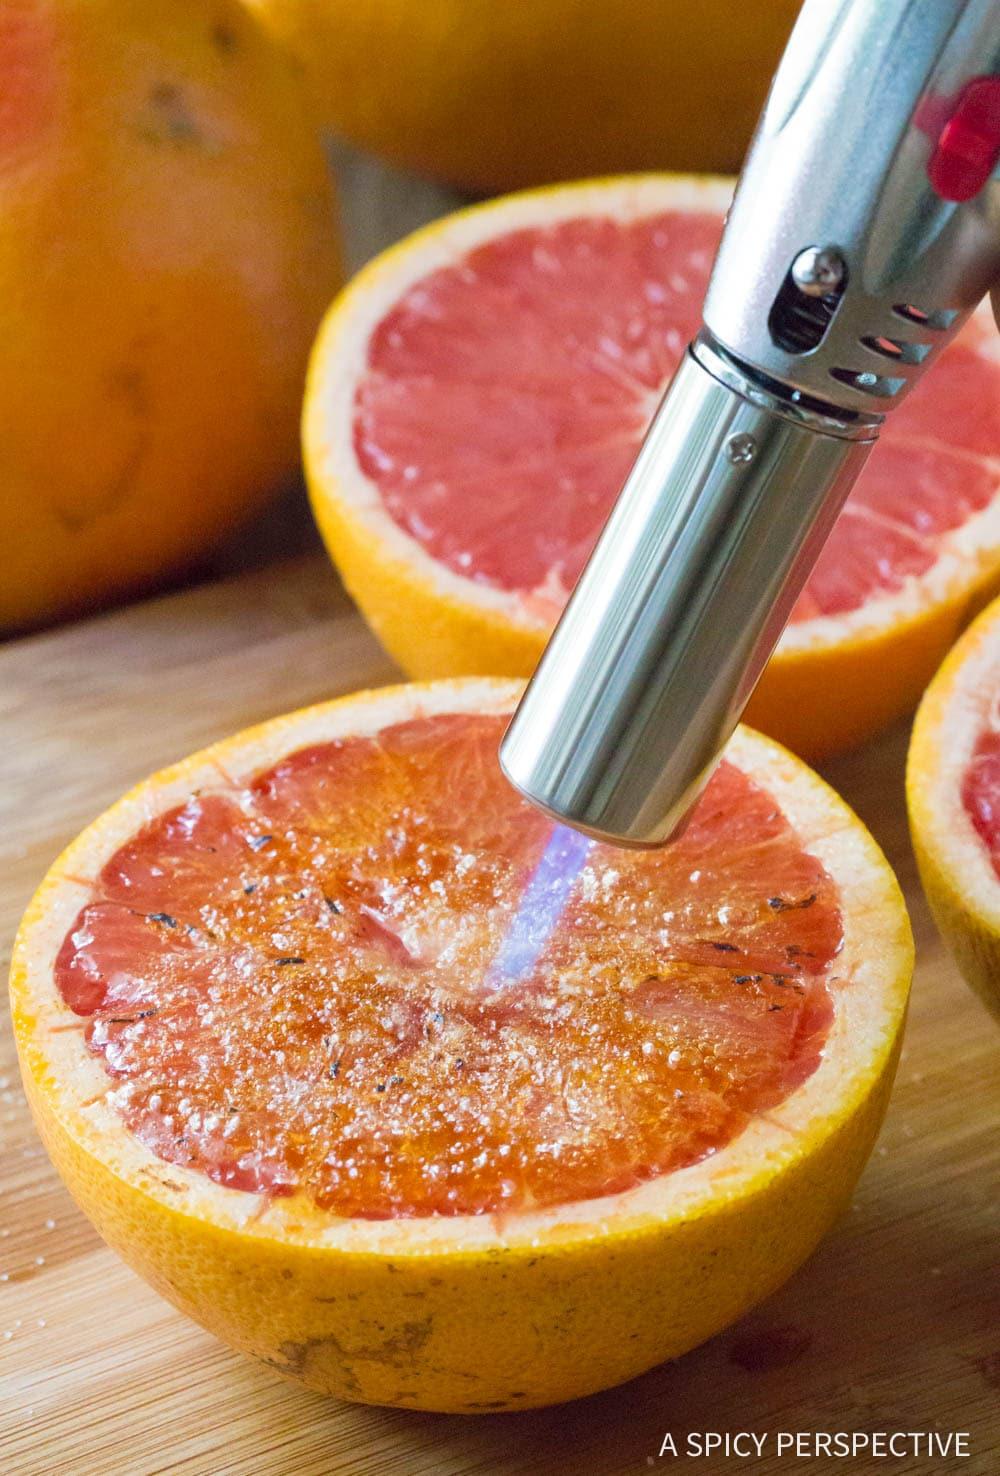 Bruleed Grapefruit (Pamplemousse Brûlé) Recipe #ASpicyPerspective #vegan #vegetarian #healthy